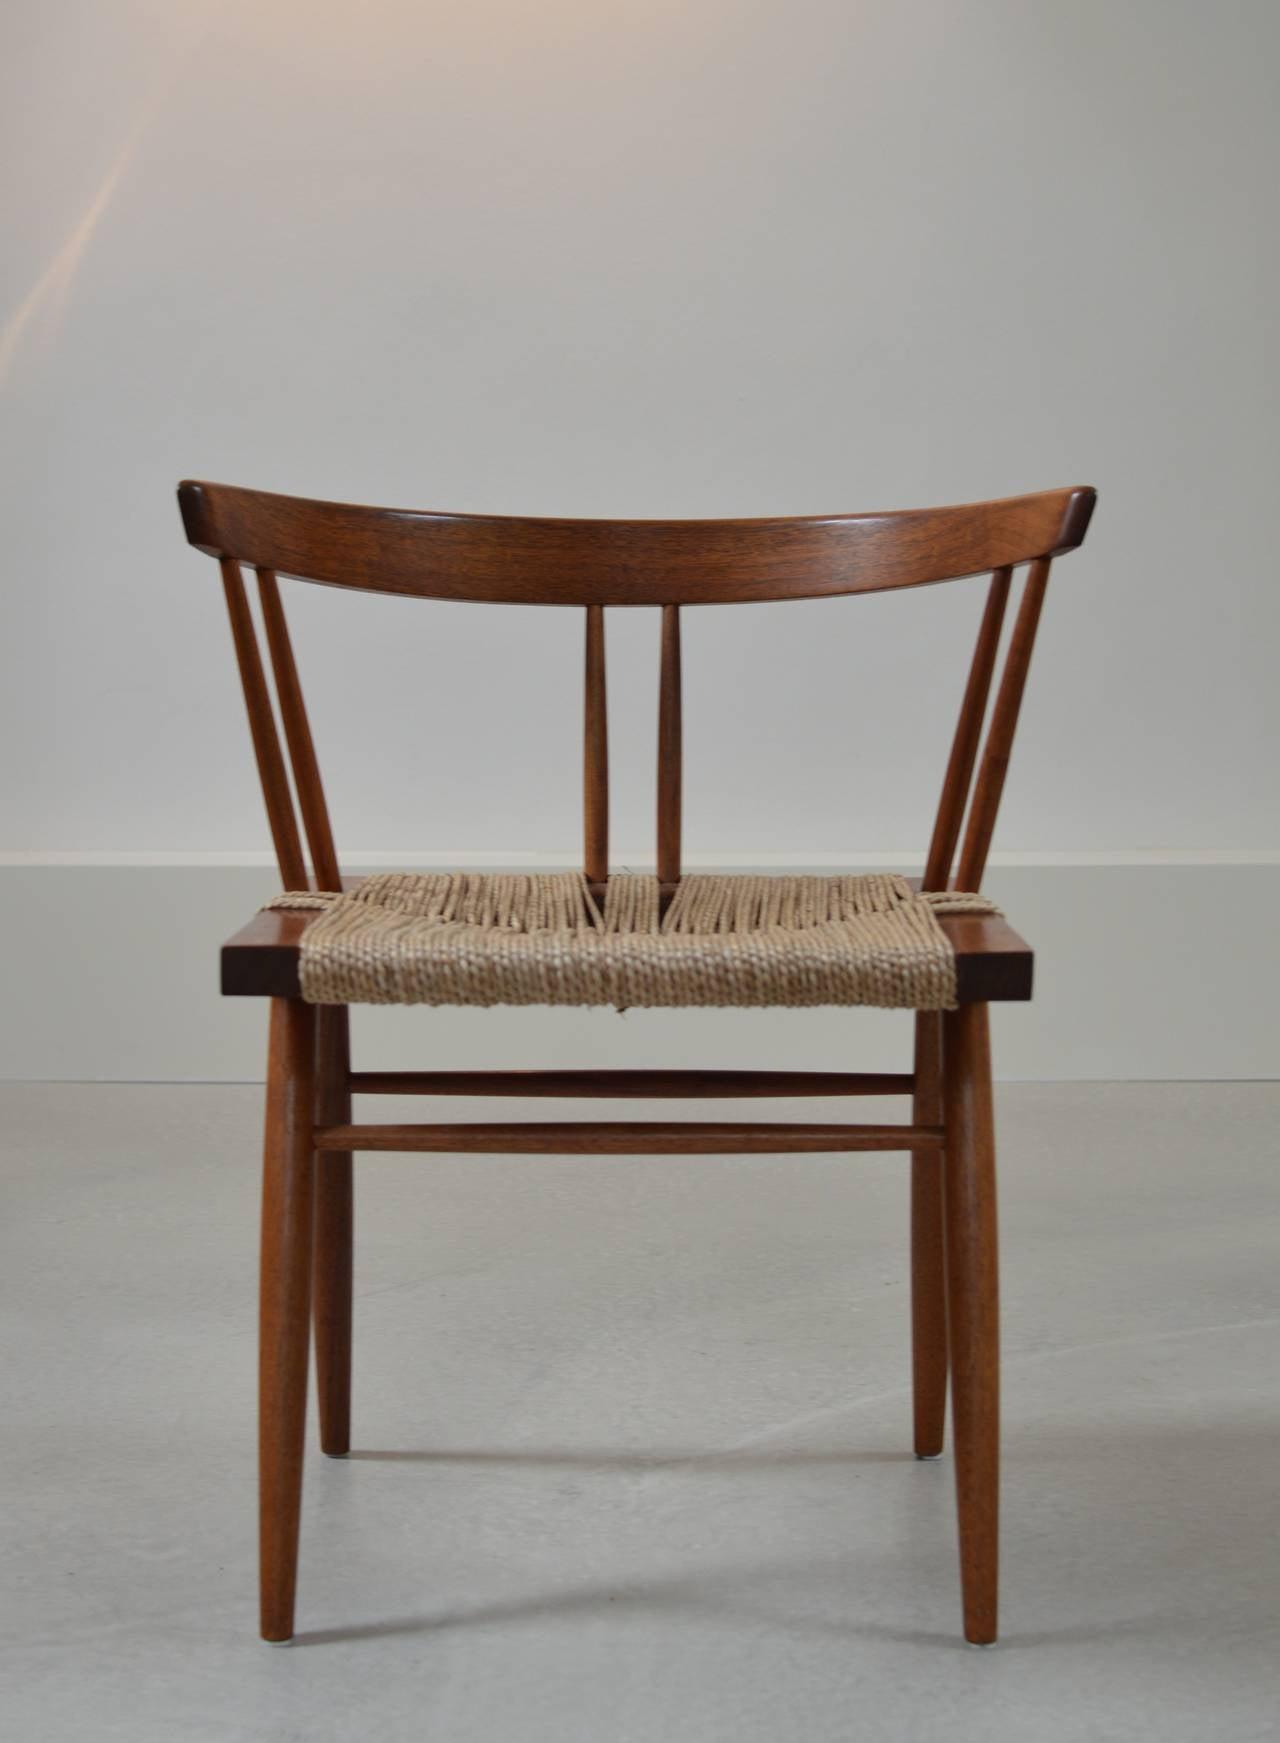 George Nakashima Black Walnut Grass Seat Chairs 2